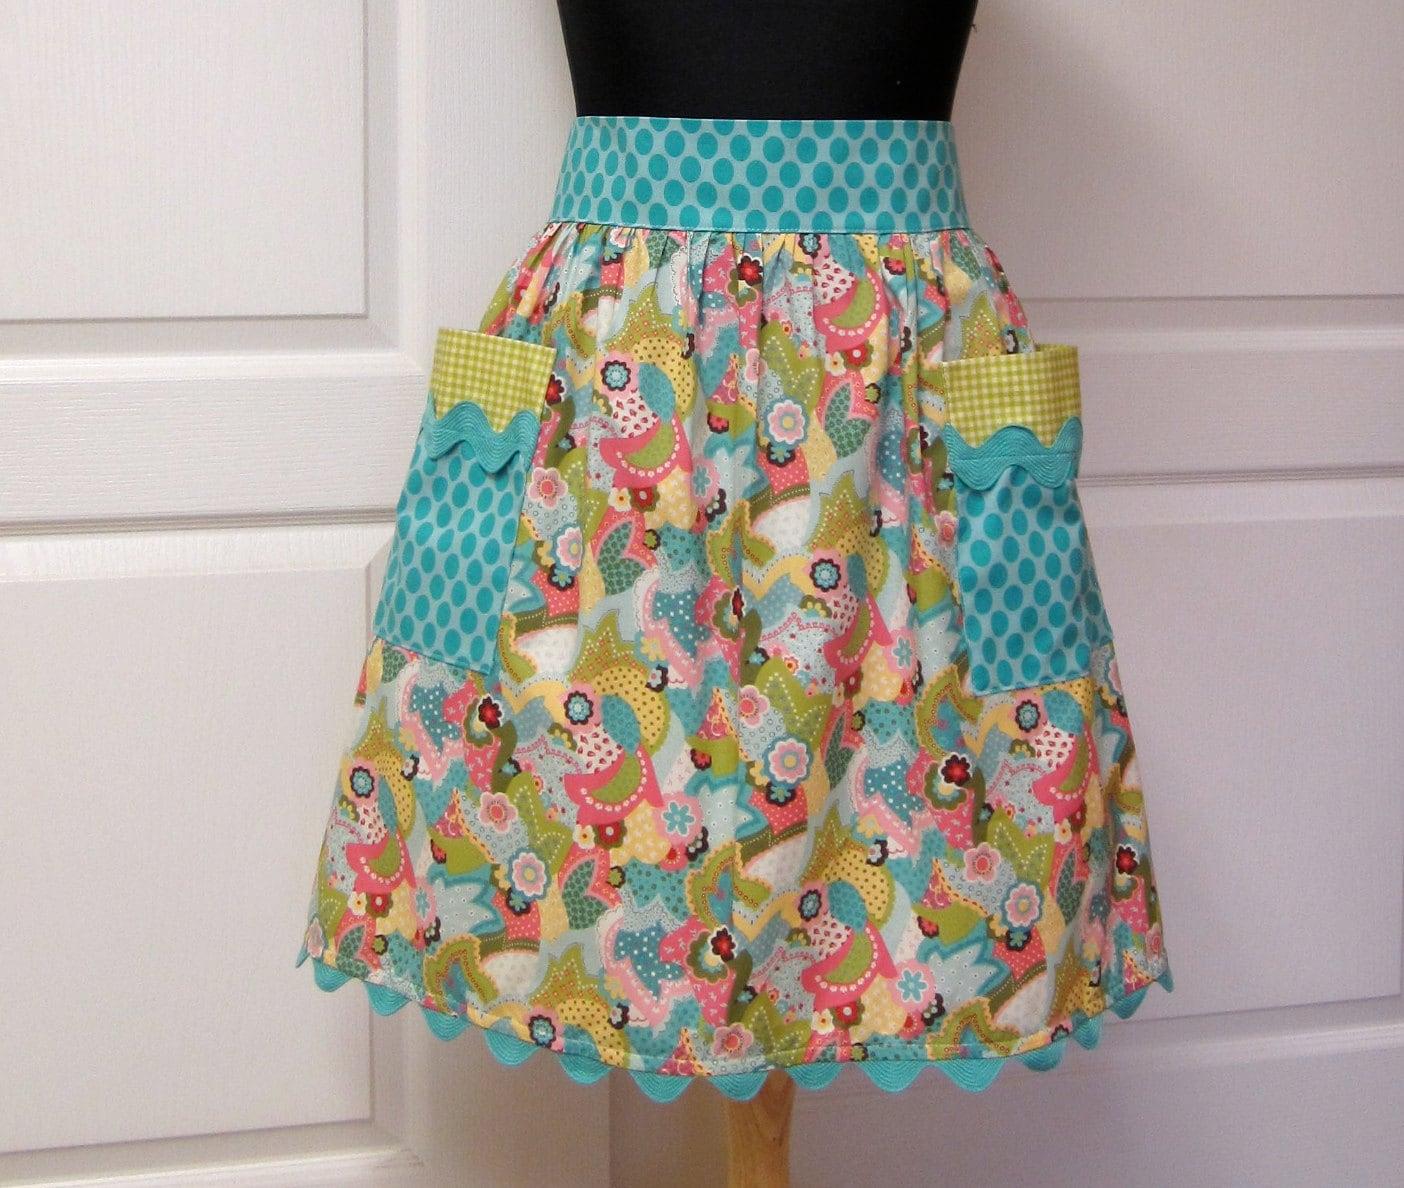 cute kitchen aprons fatigue mats sophie retro half apron mulit color handmade womens by